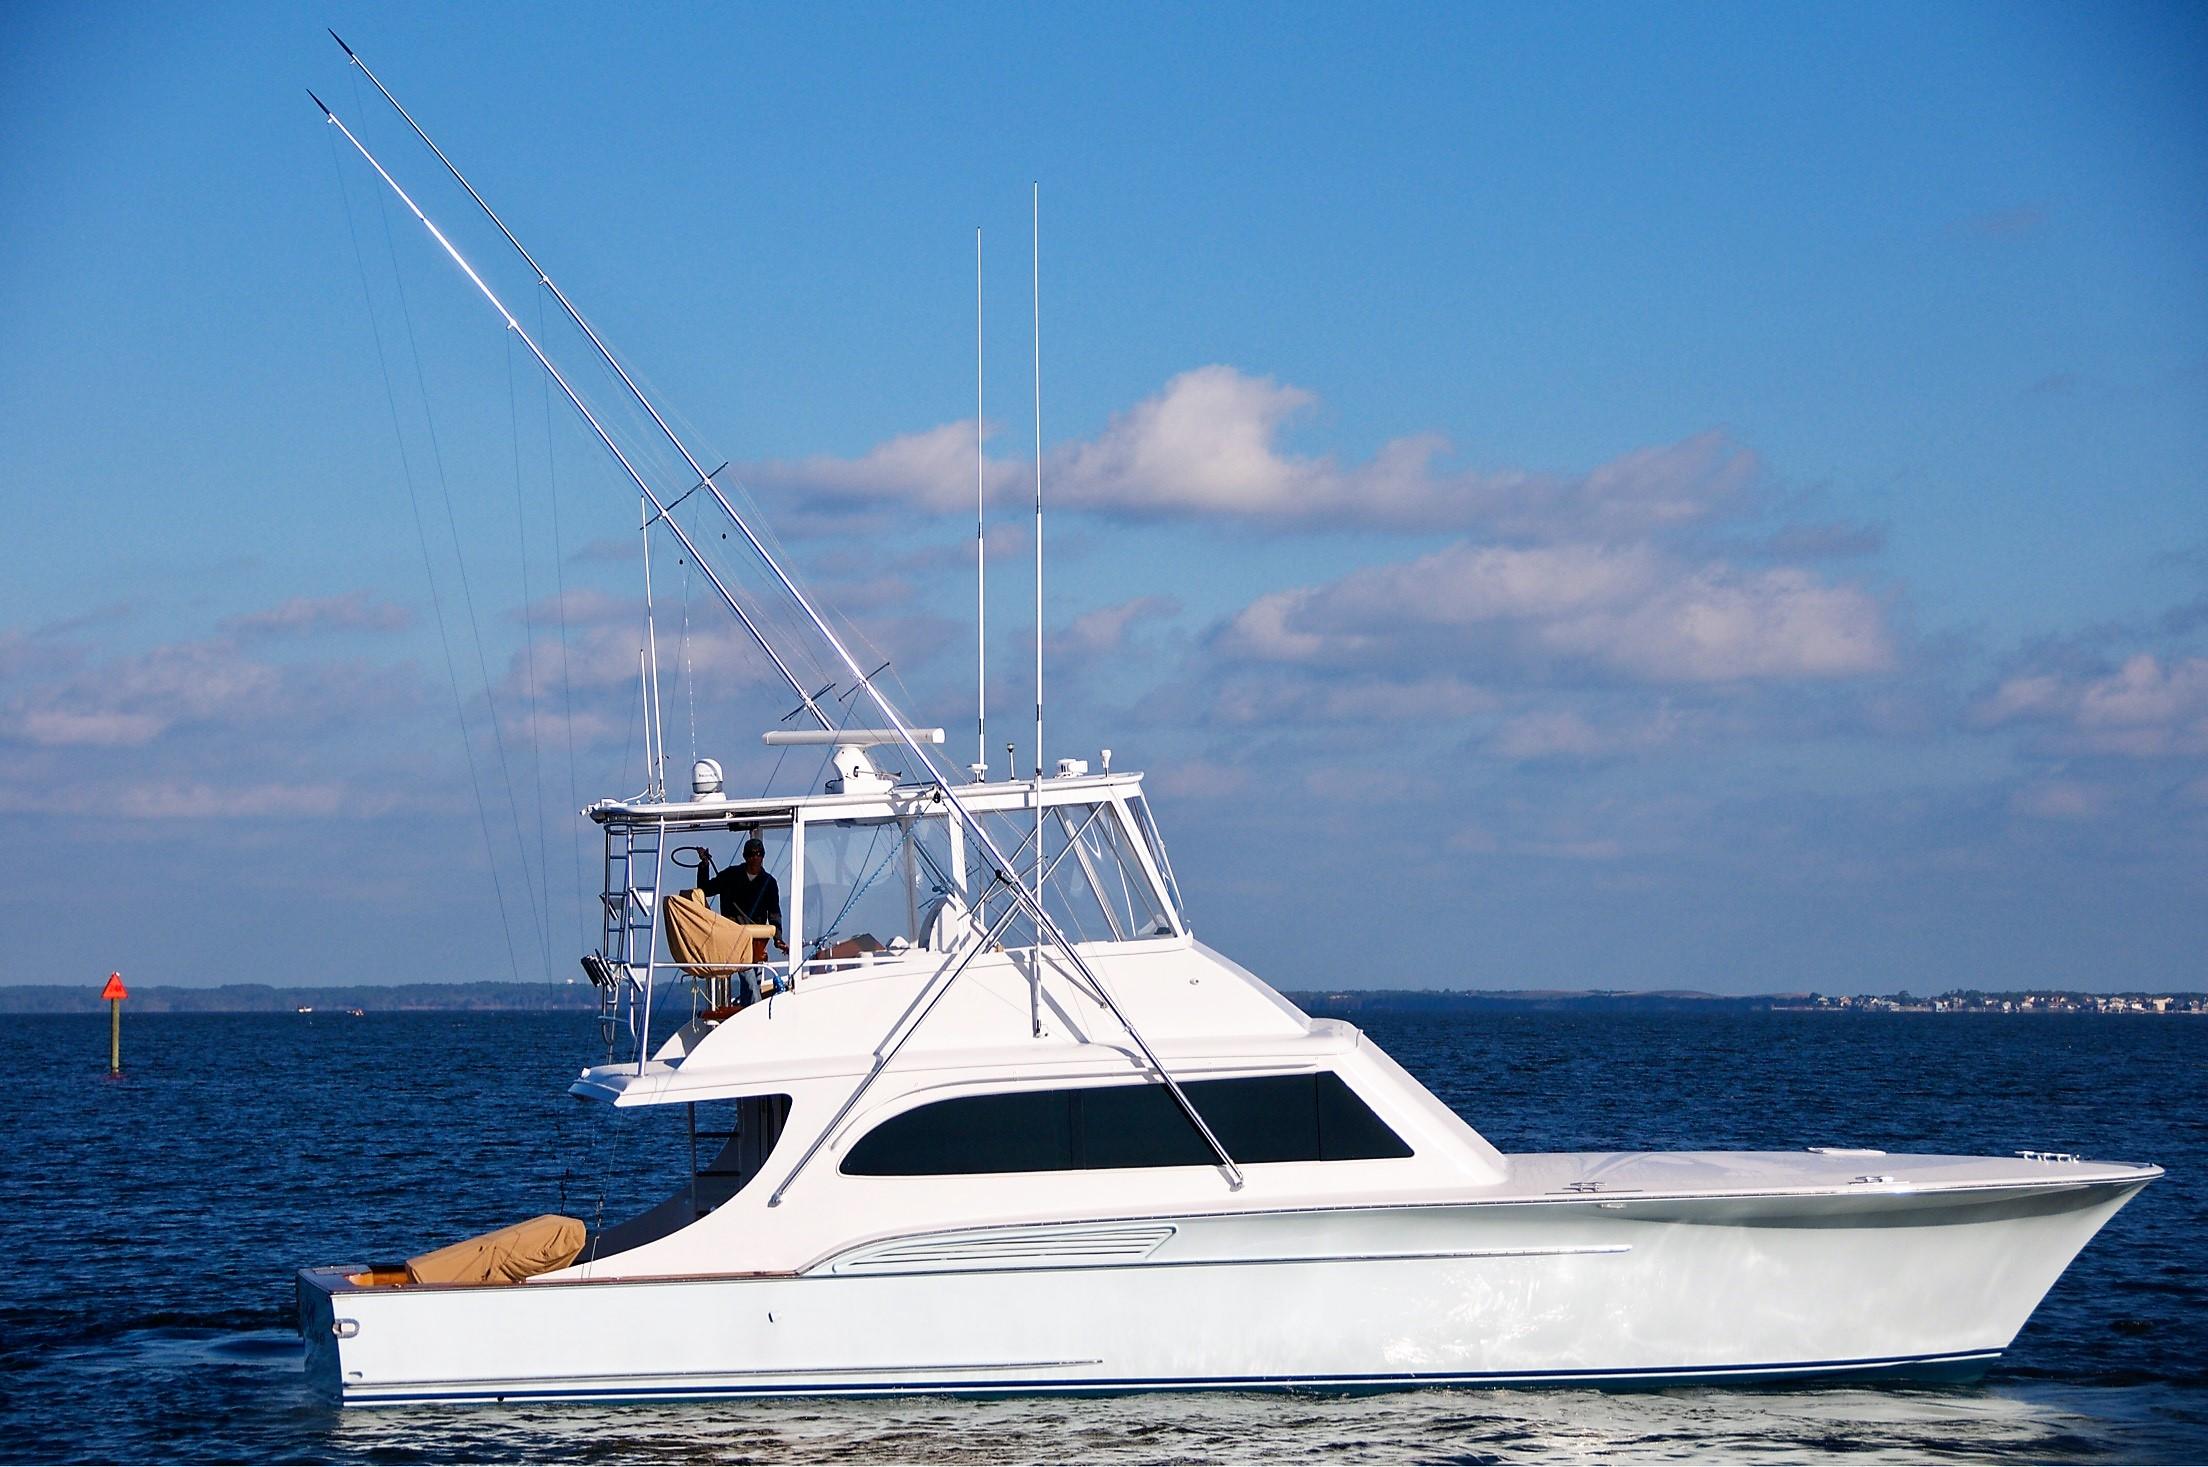 960cea4f7cf4f Deep Blue Buddy Davis 2000 Custom Carolina 52 Yacht for Sale in US